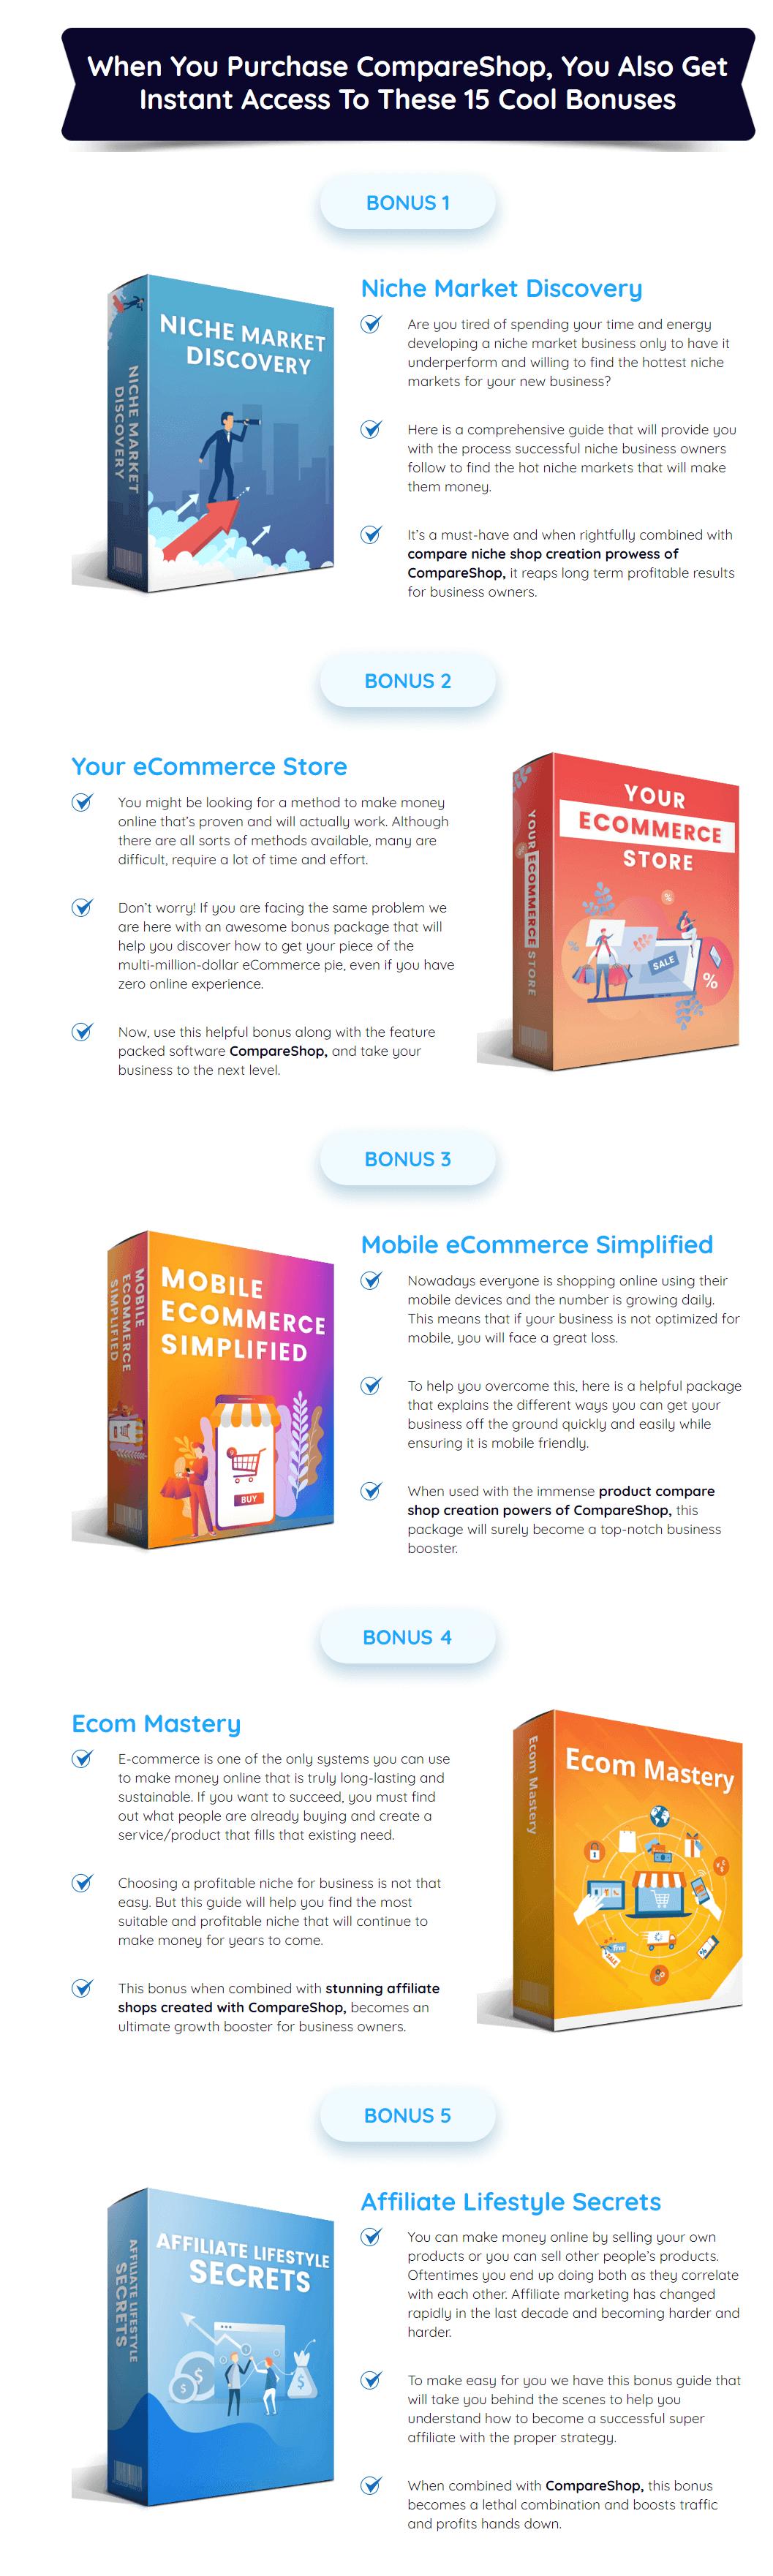 compareshop Bonuses